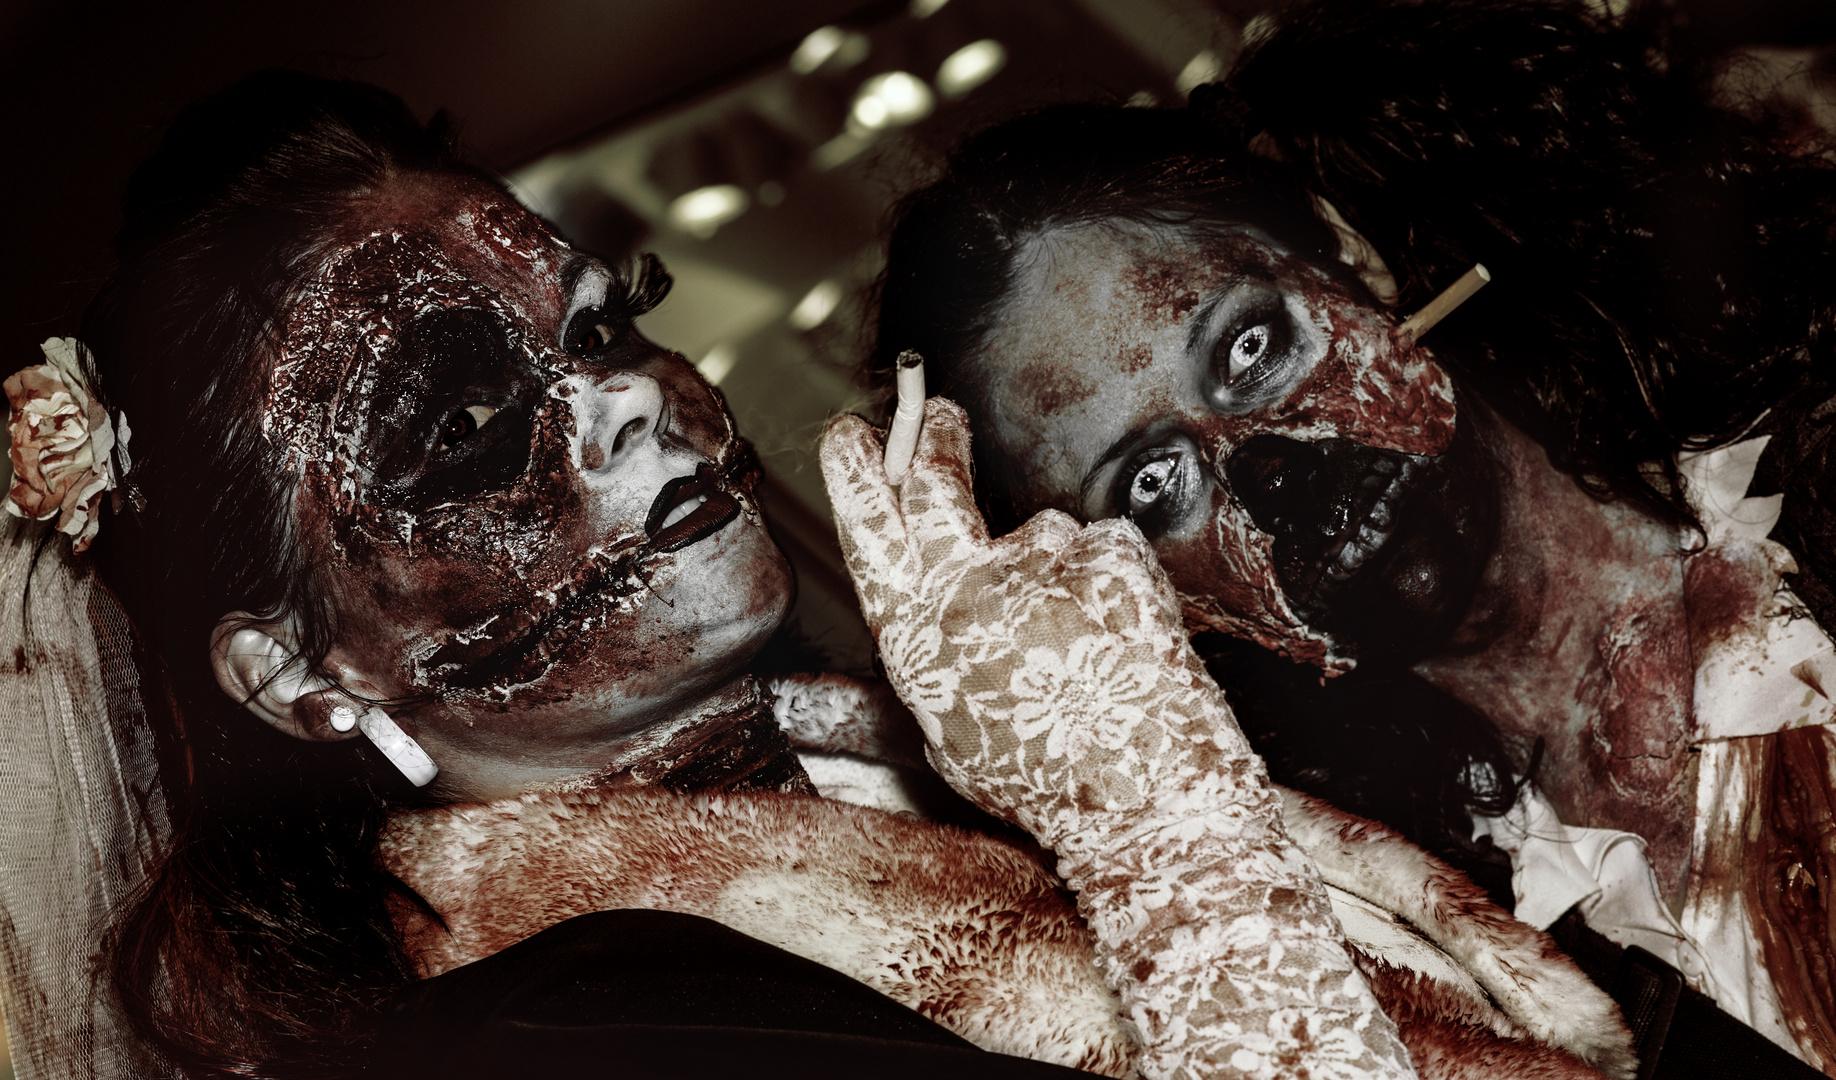 Horrorladys ...